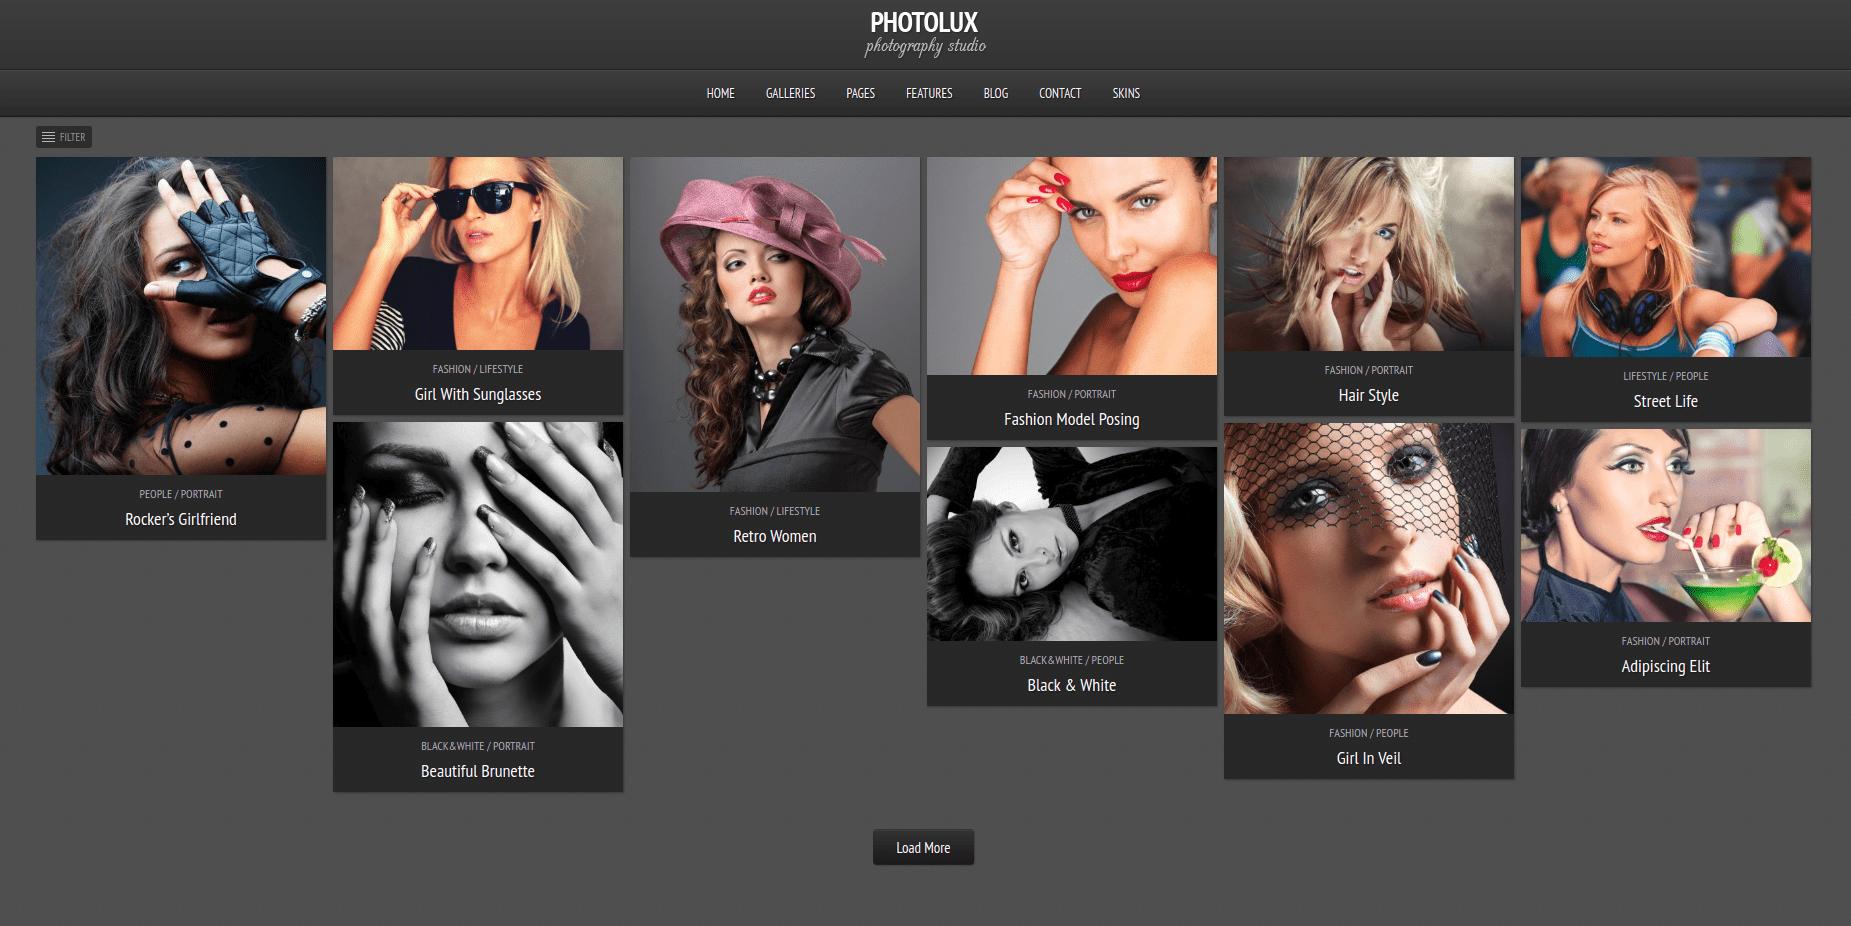 Photolux photography